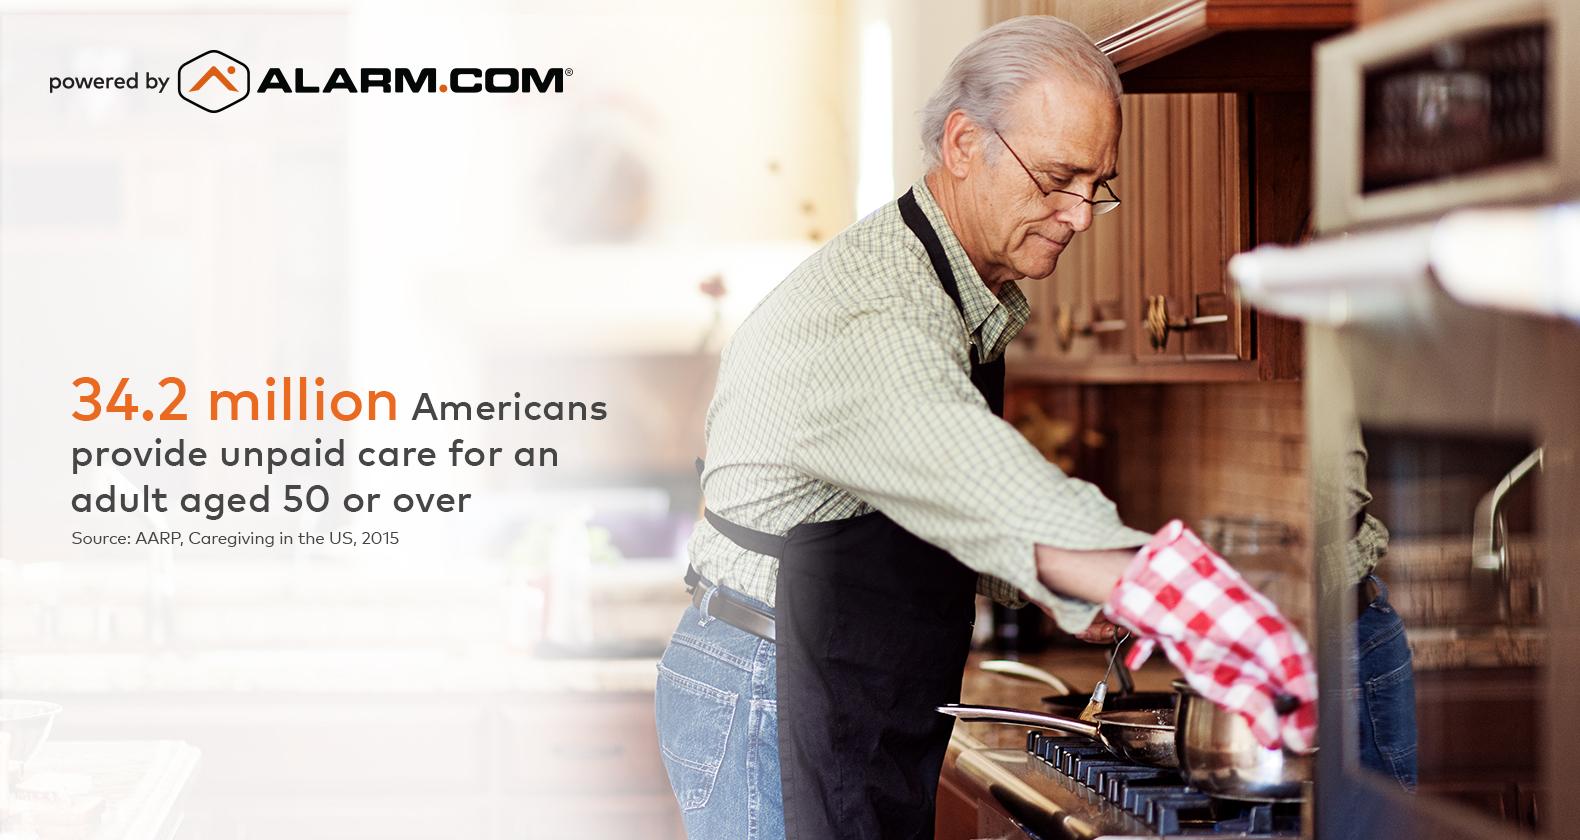 Alarm.com Wellness 2 FB.jpg